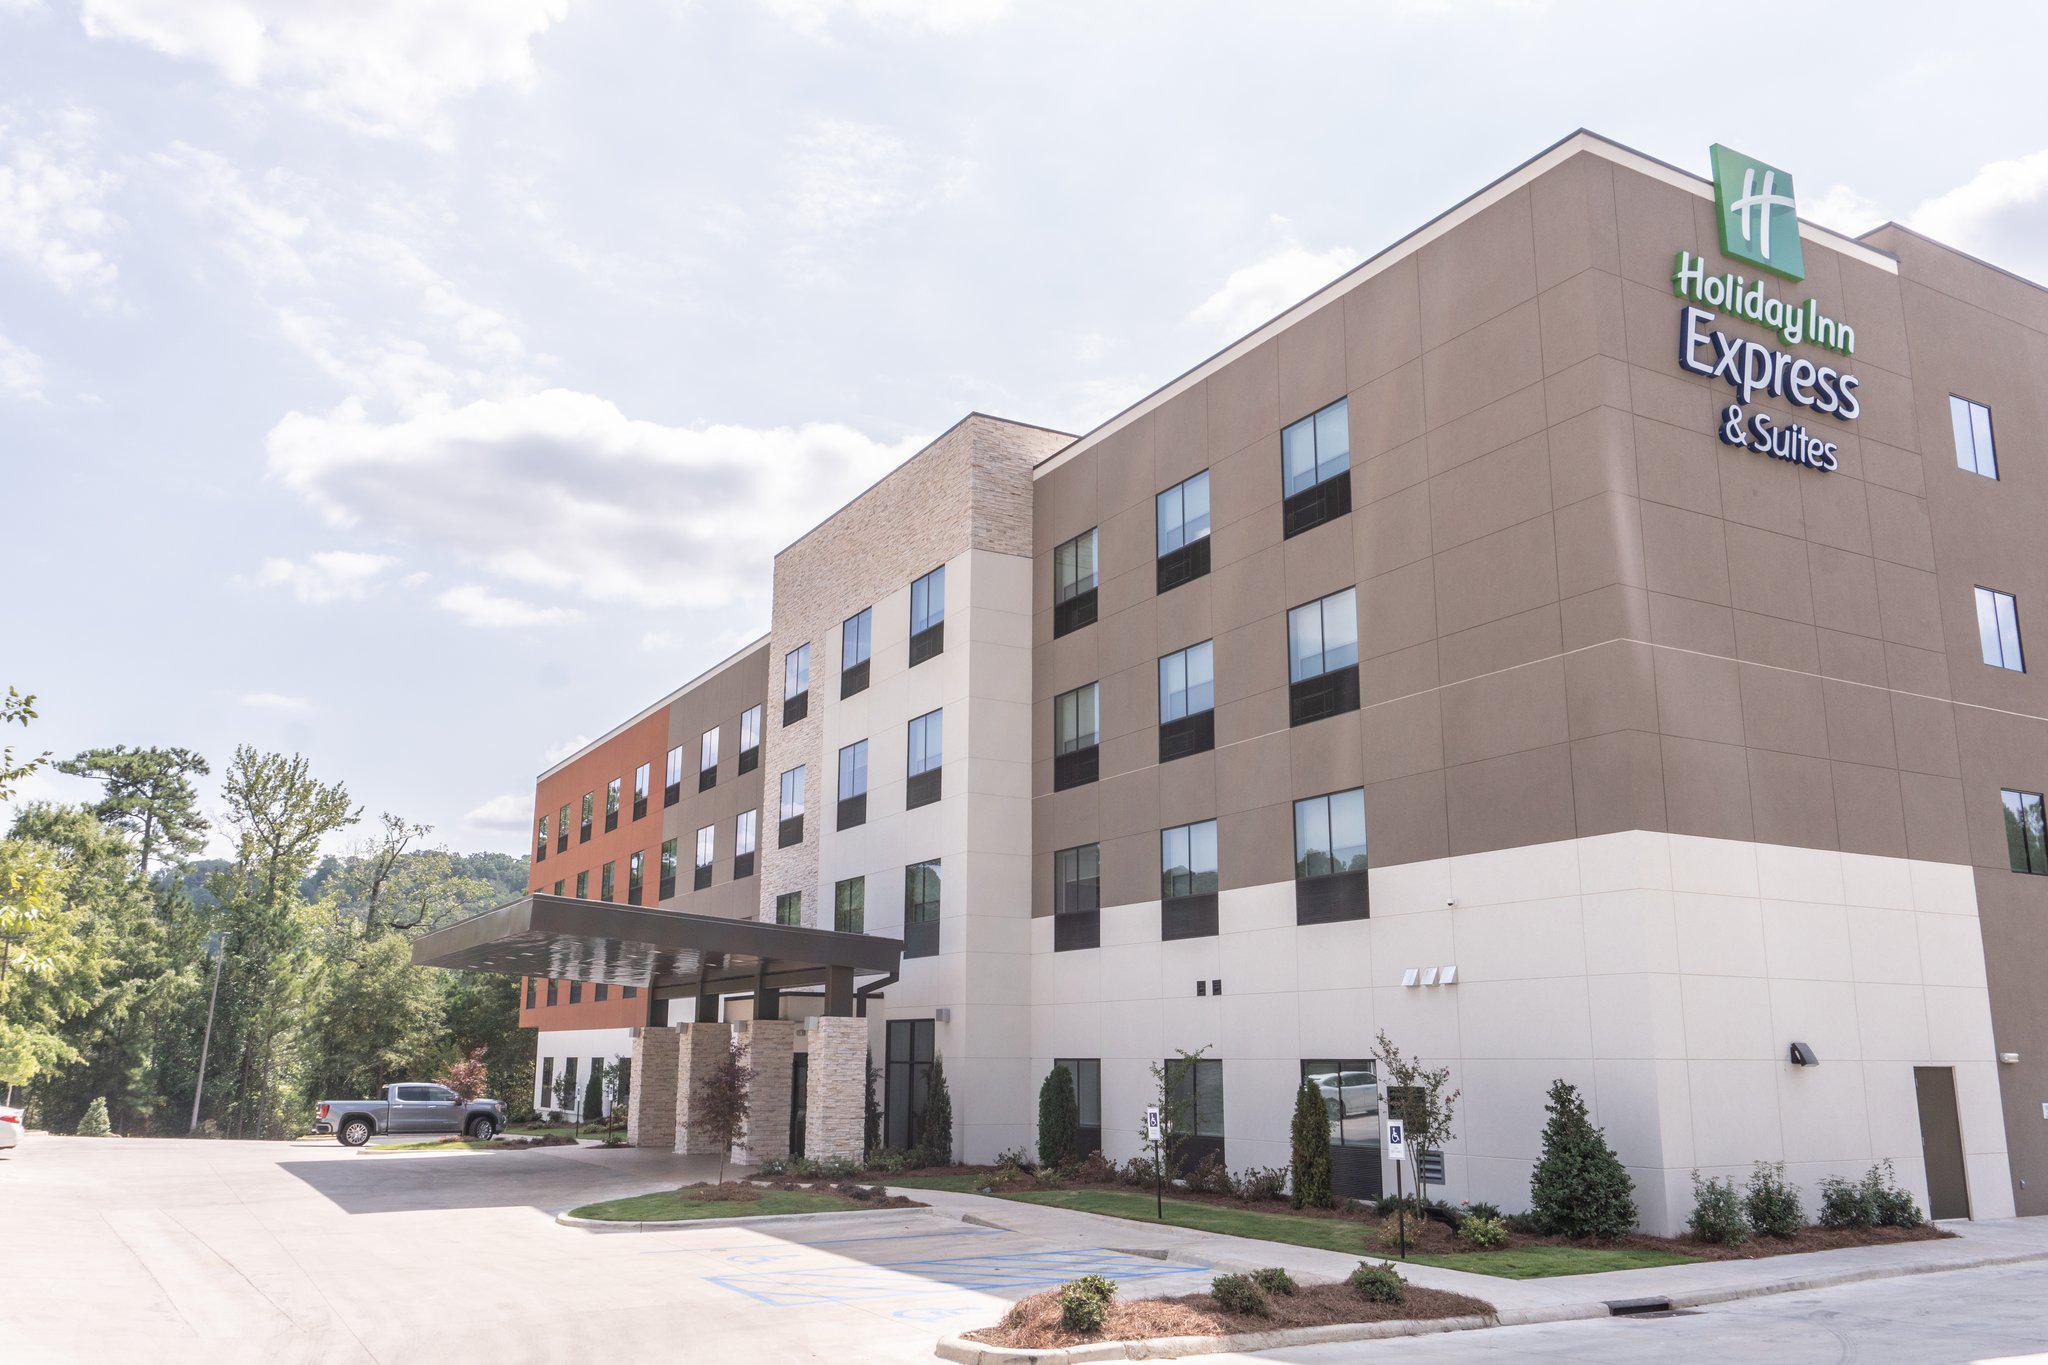 Holiday Inn Express & Suites Birmingham - Homewood, an IHG Hotel